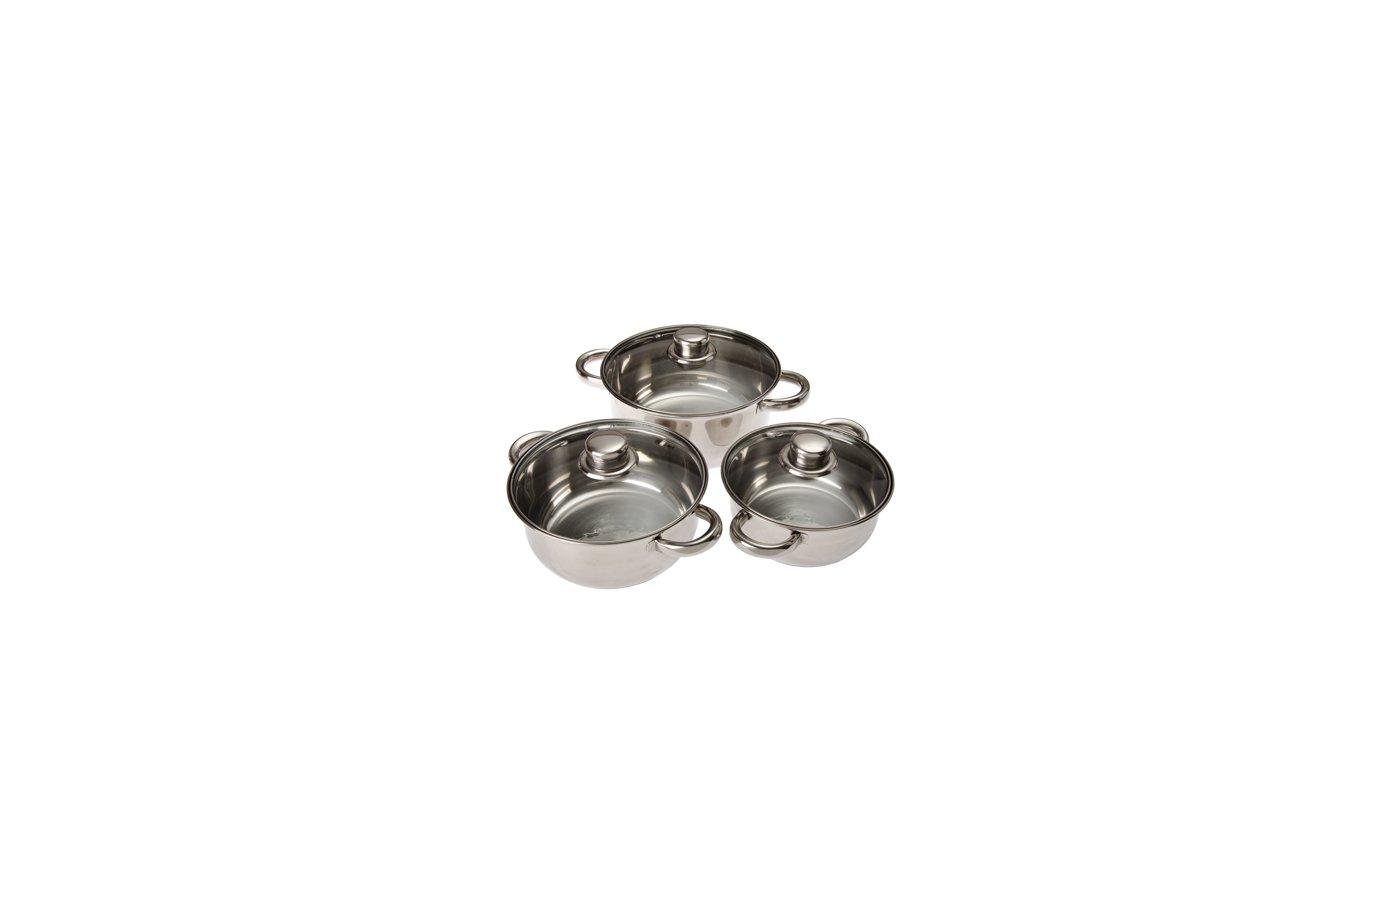 Набор посуды VETTA 822-038 Набор посуды 3 кастрюли 1.5л+2.1л+2.9л с крышками